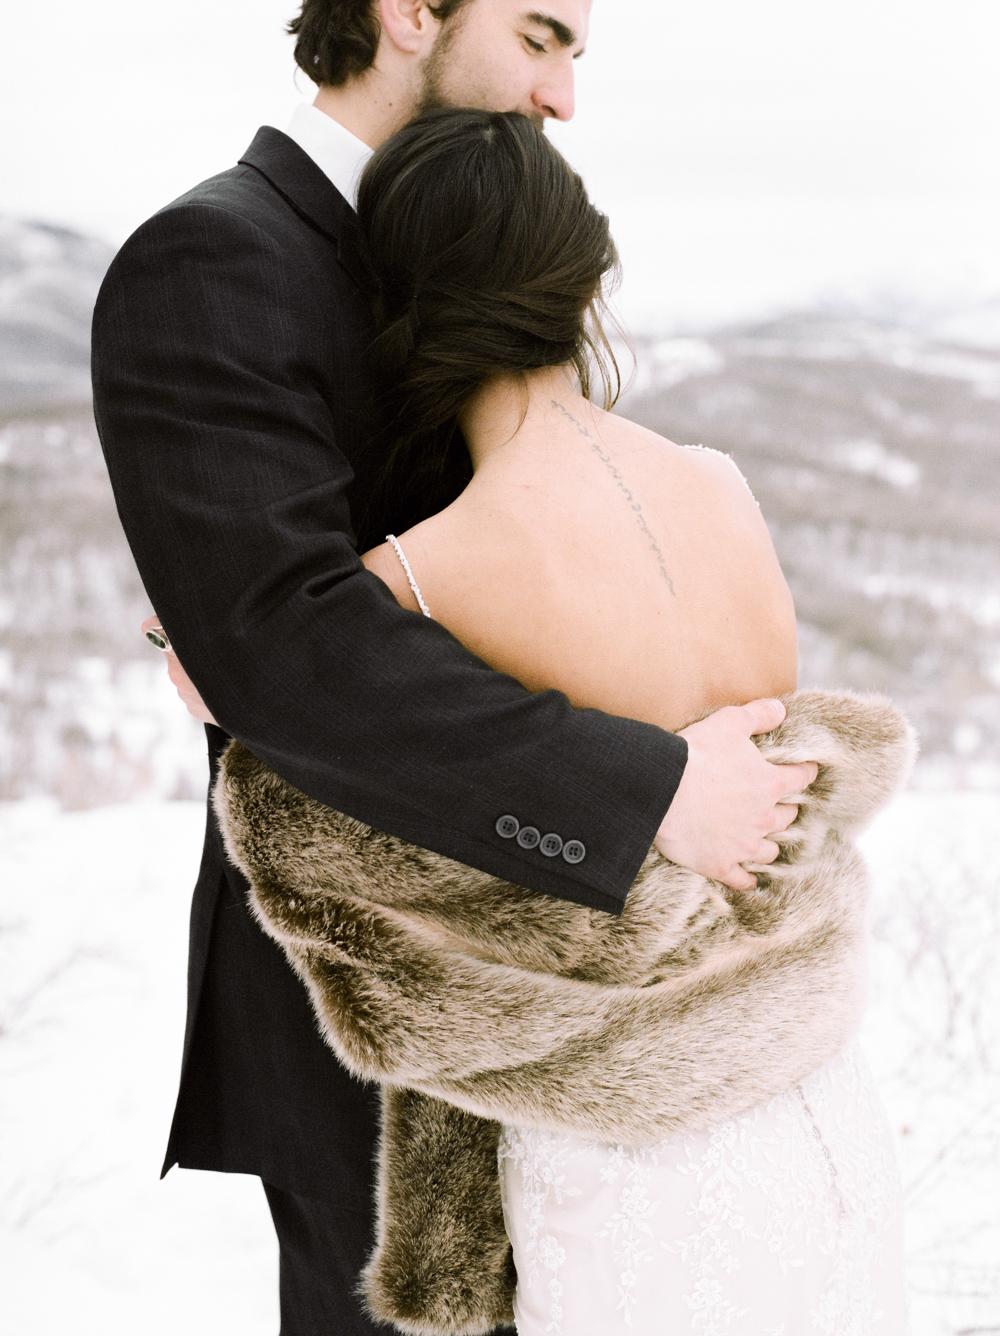 Christine-Gosch-Utah-film-photographer-wedding-mountains-snow-snowy-destination-16.jpg